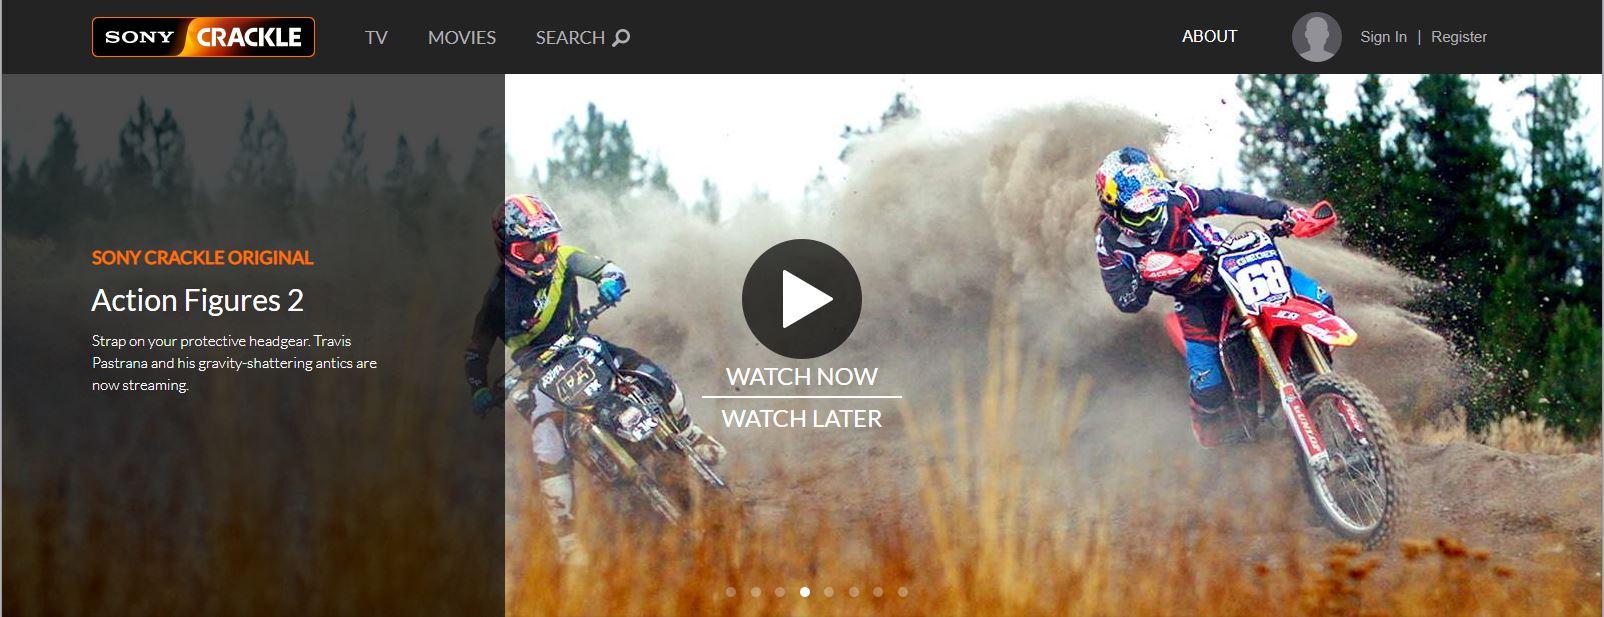 Screenshot of Sony Crackle website